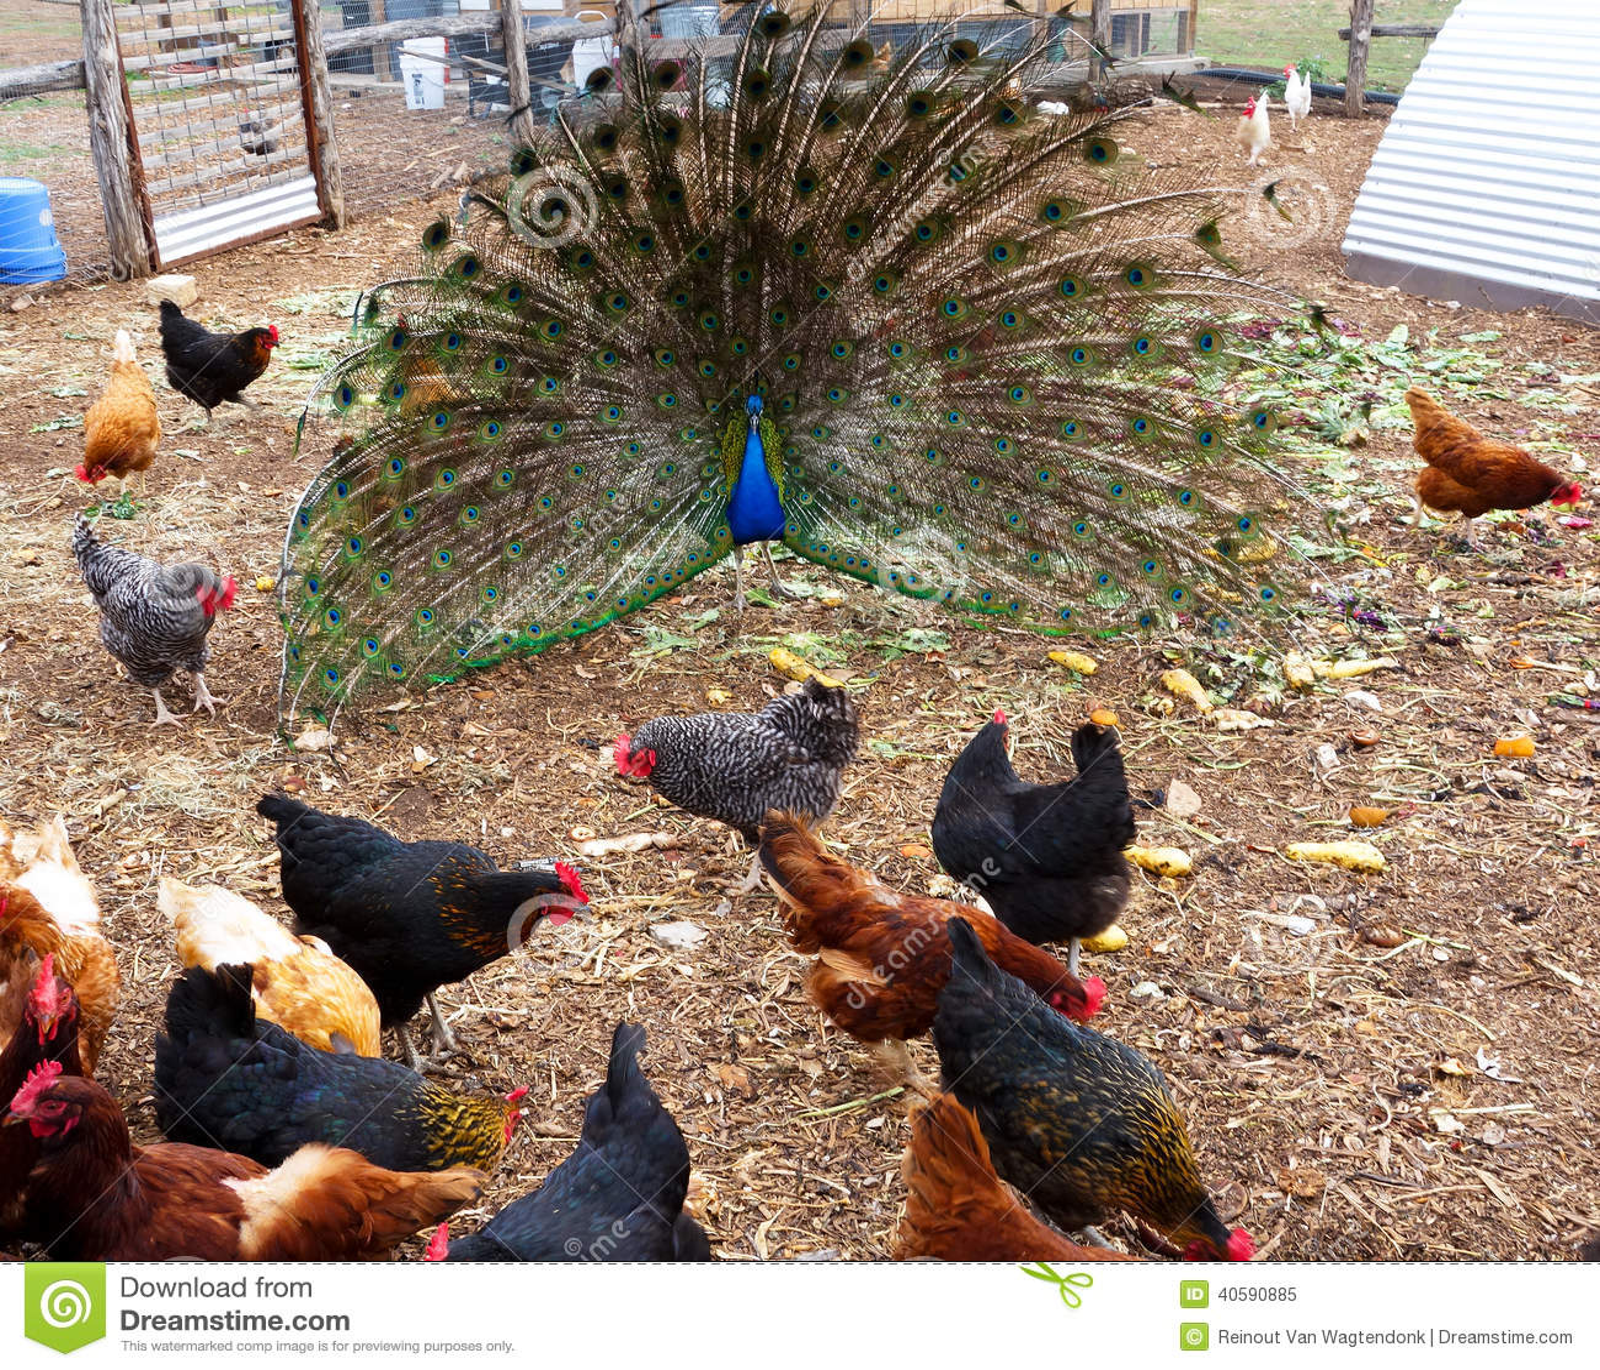 Peacock in chicken run